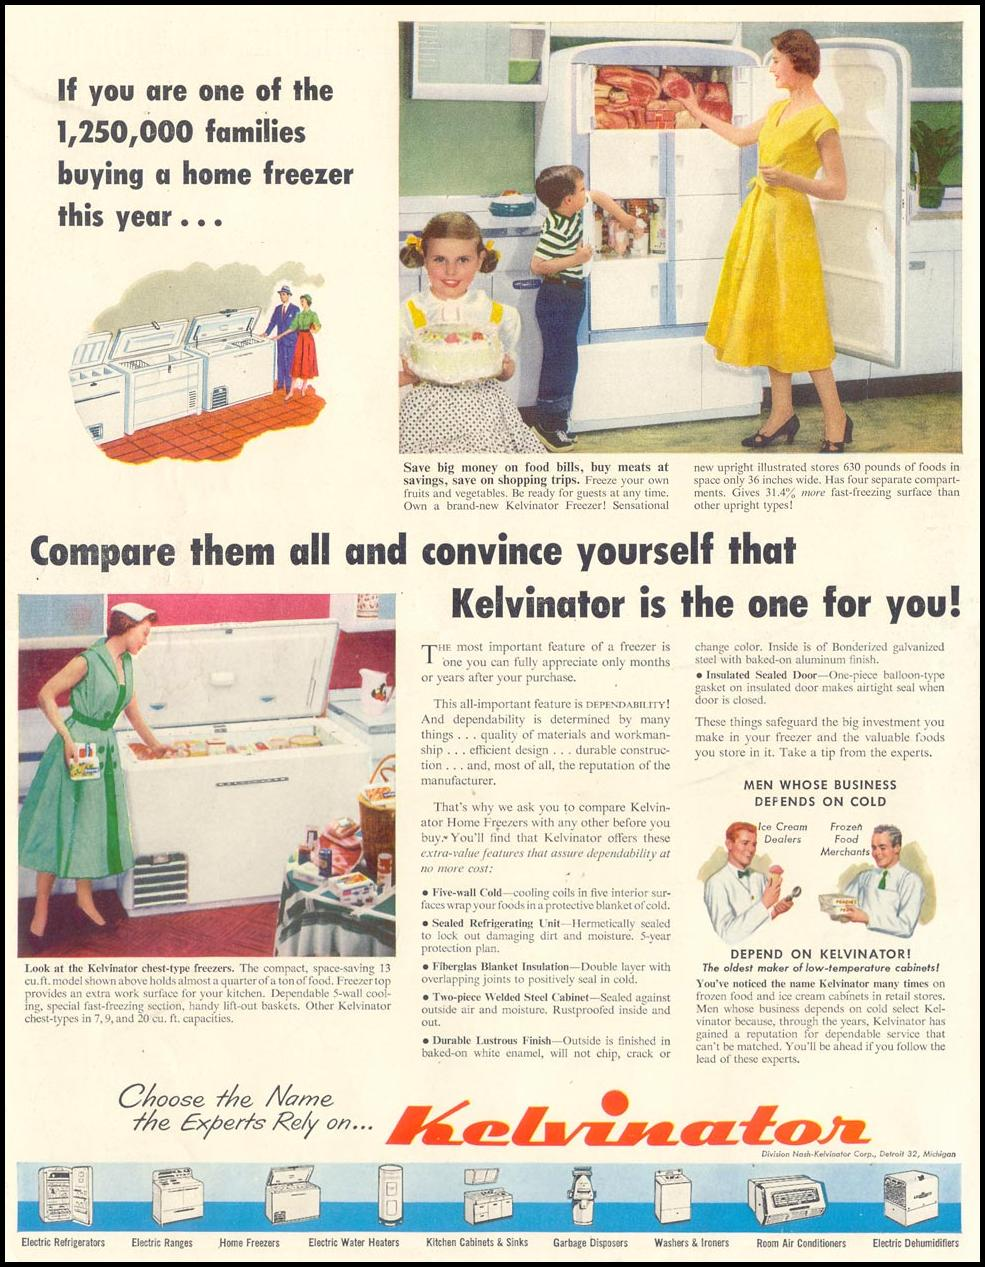 KELVINATOR REFRIGERATORS LIFE 07/06/1953 INSIDE FRONT